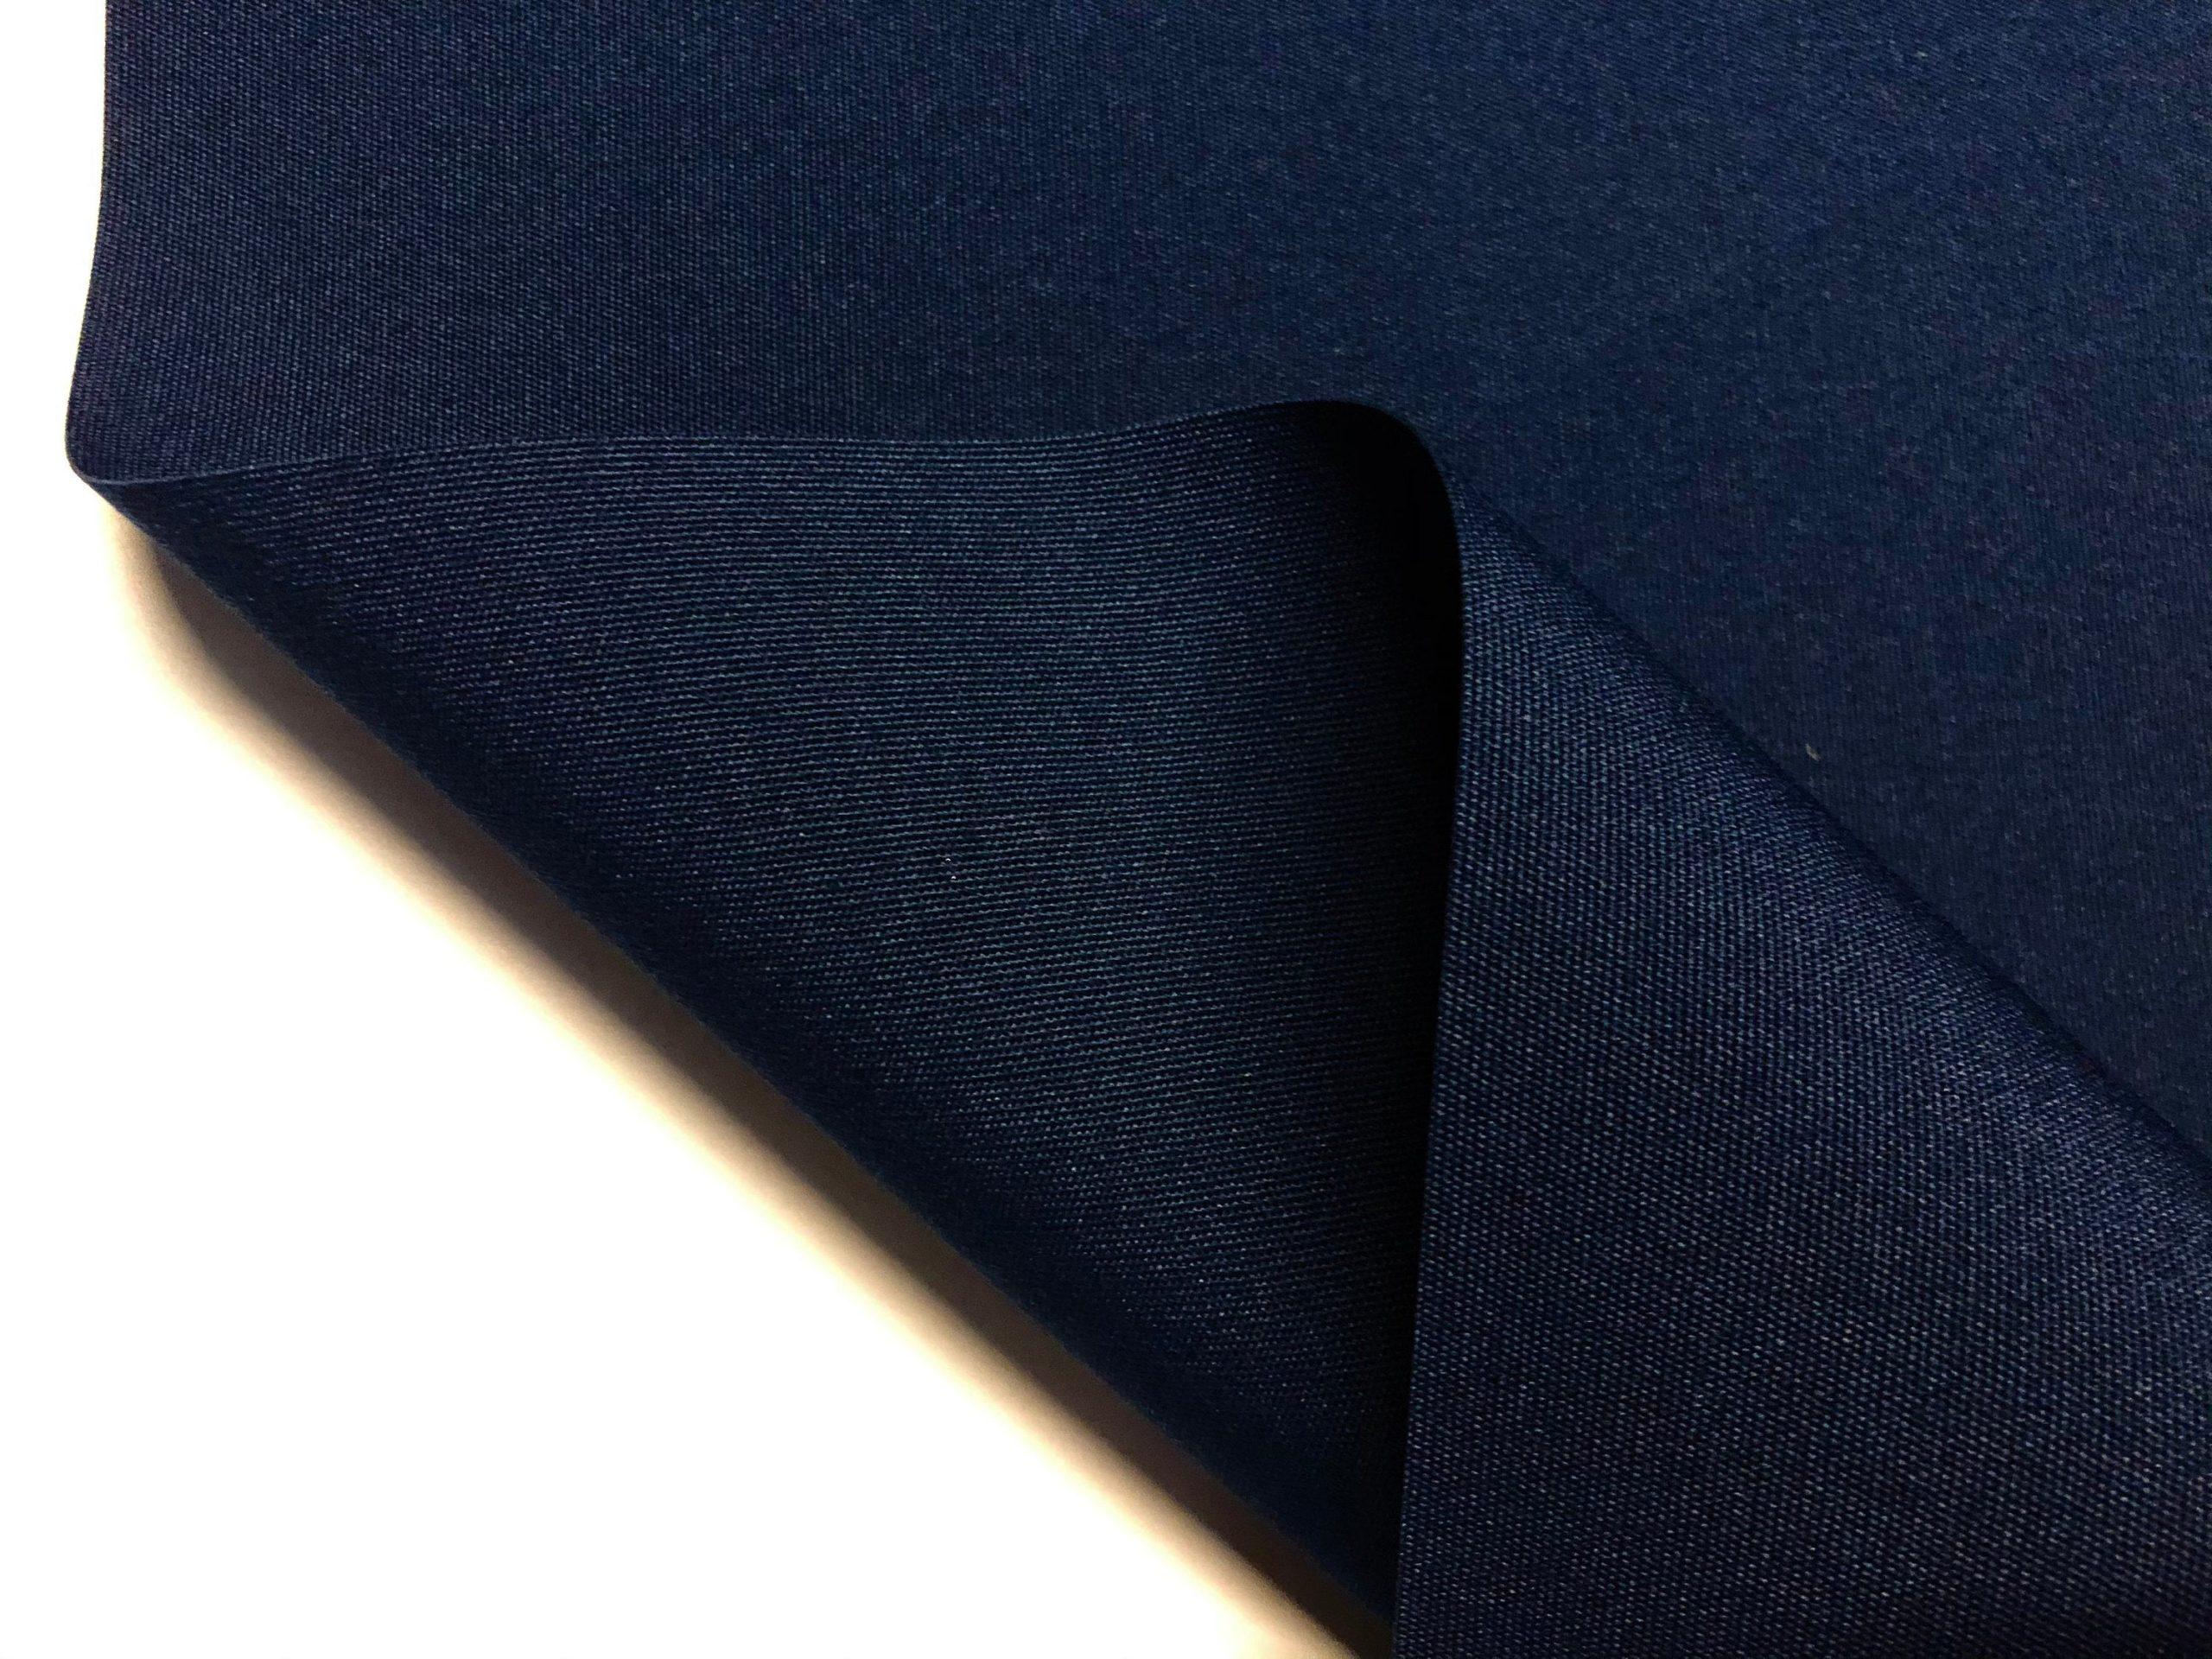 "Navy Blue Plain DRALON Outdoor Fabric Solid Acrylic Teflon Waterproof Upholstery Material For Cushion Gazebo Beach – 125""/320cm Wide"